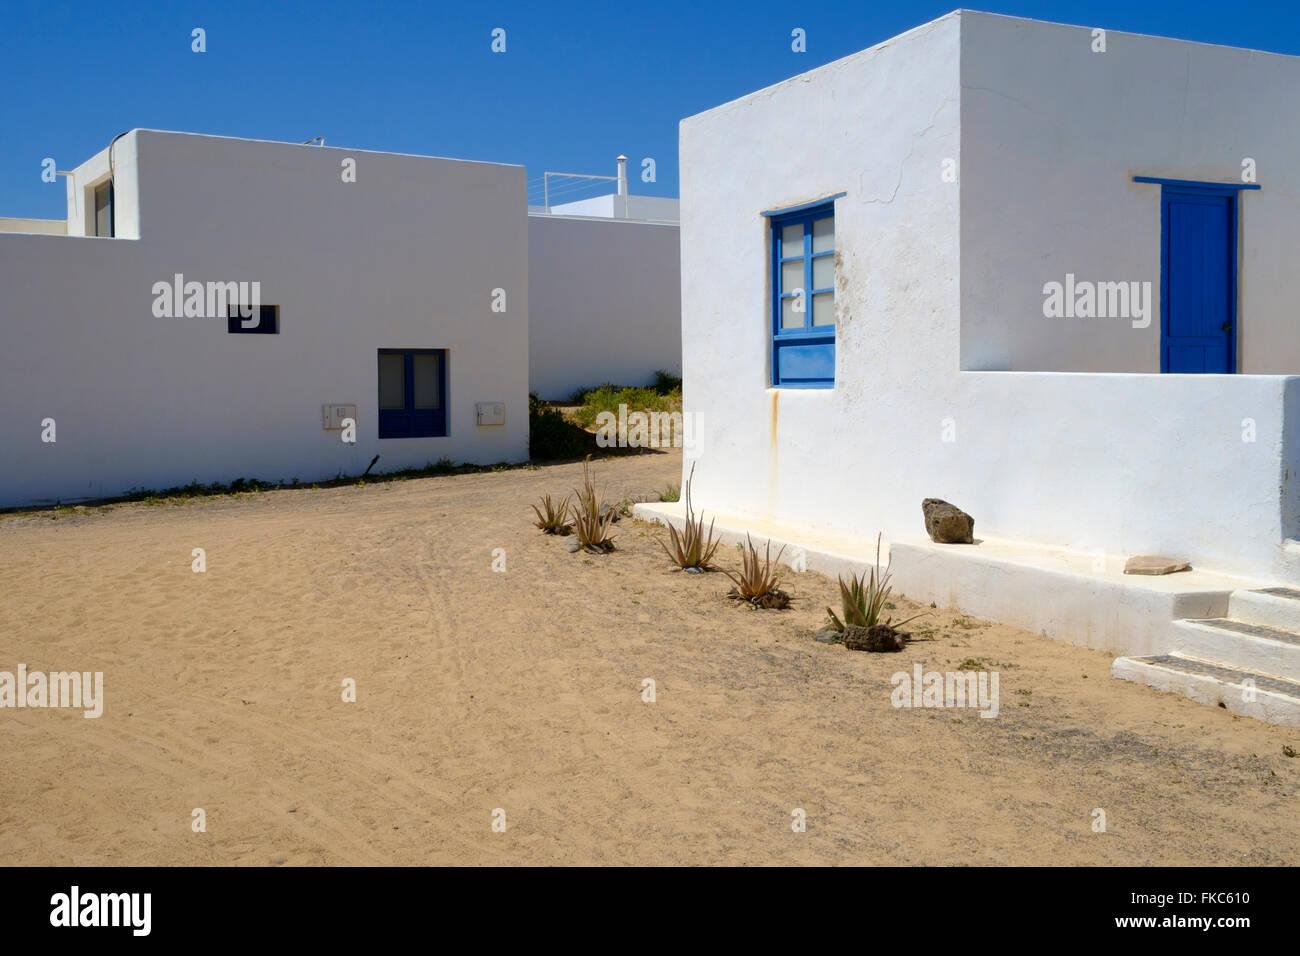 Weiße Häuser in Avenida Virgen del Mar, Caleta de Sebo, La Graciosa, Kanarische Inseln, Spanien, Europa. Stockbild